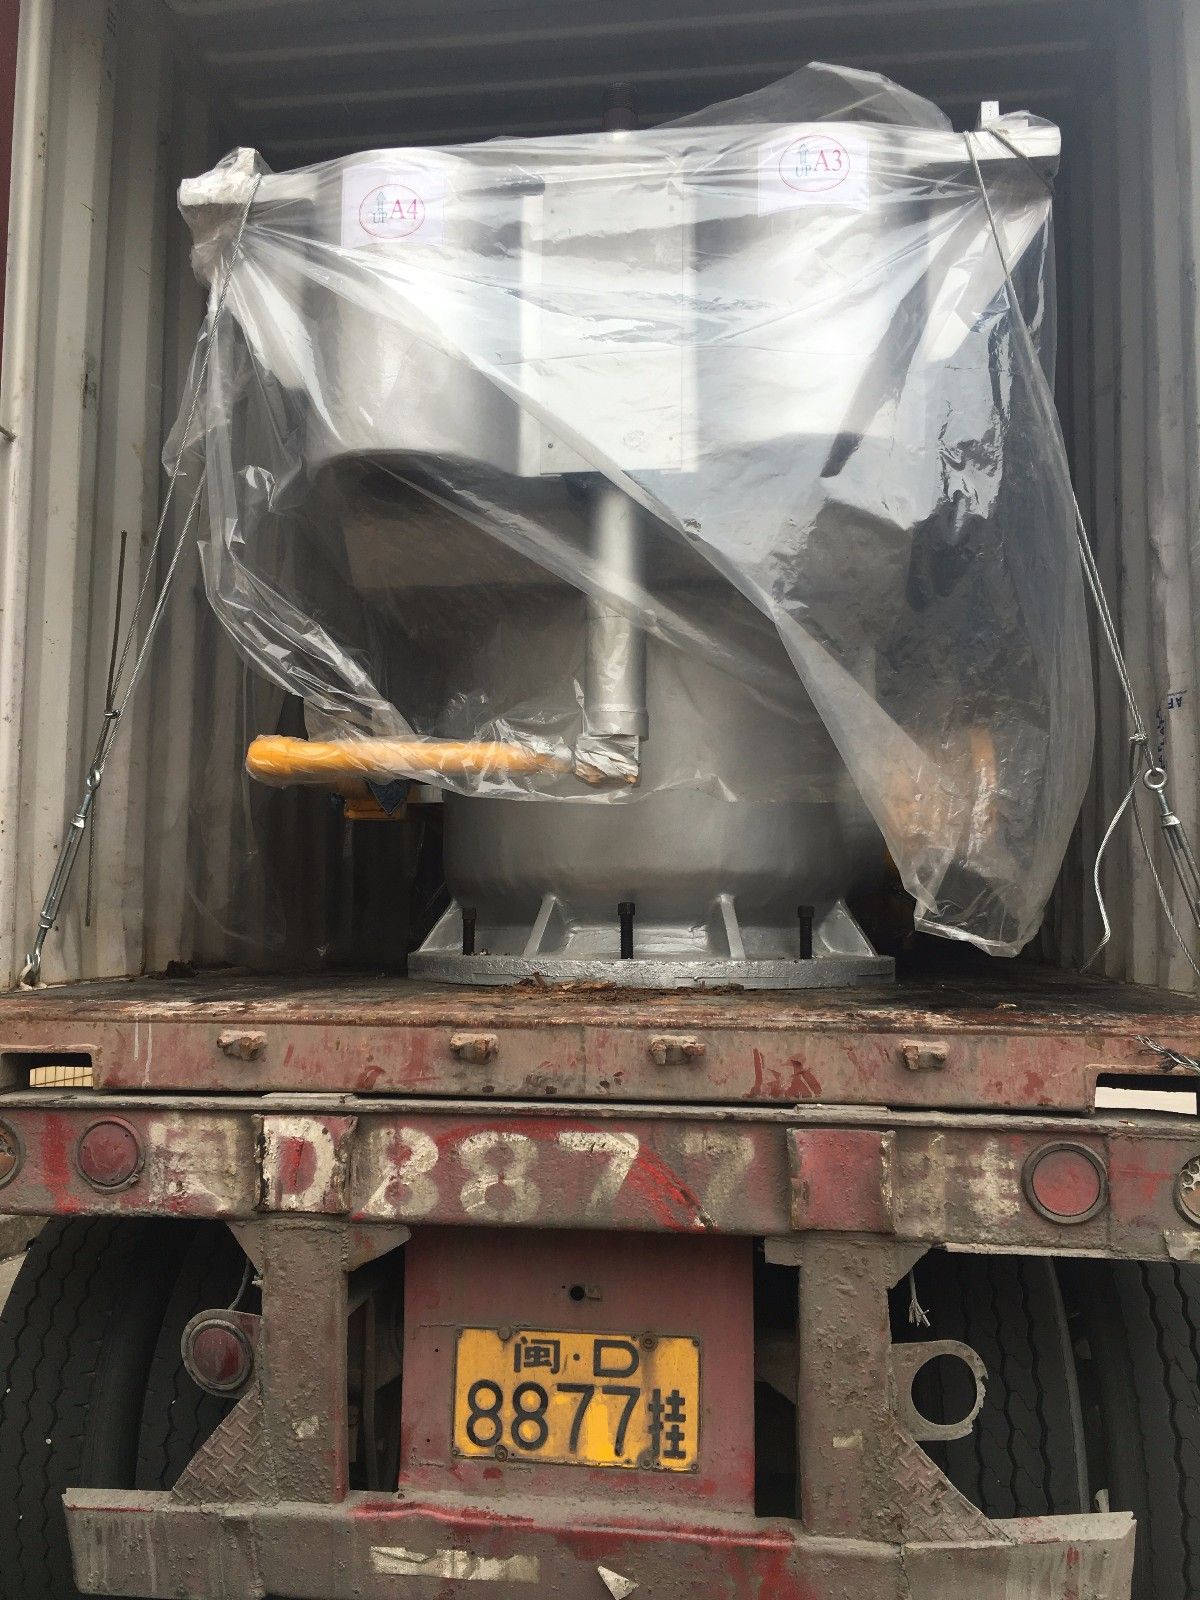 1100T hydraulic foaming press machine shipped to India customer at 2017-10-14